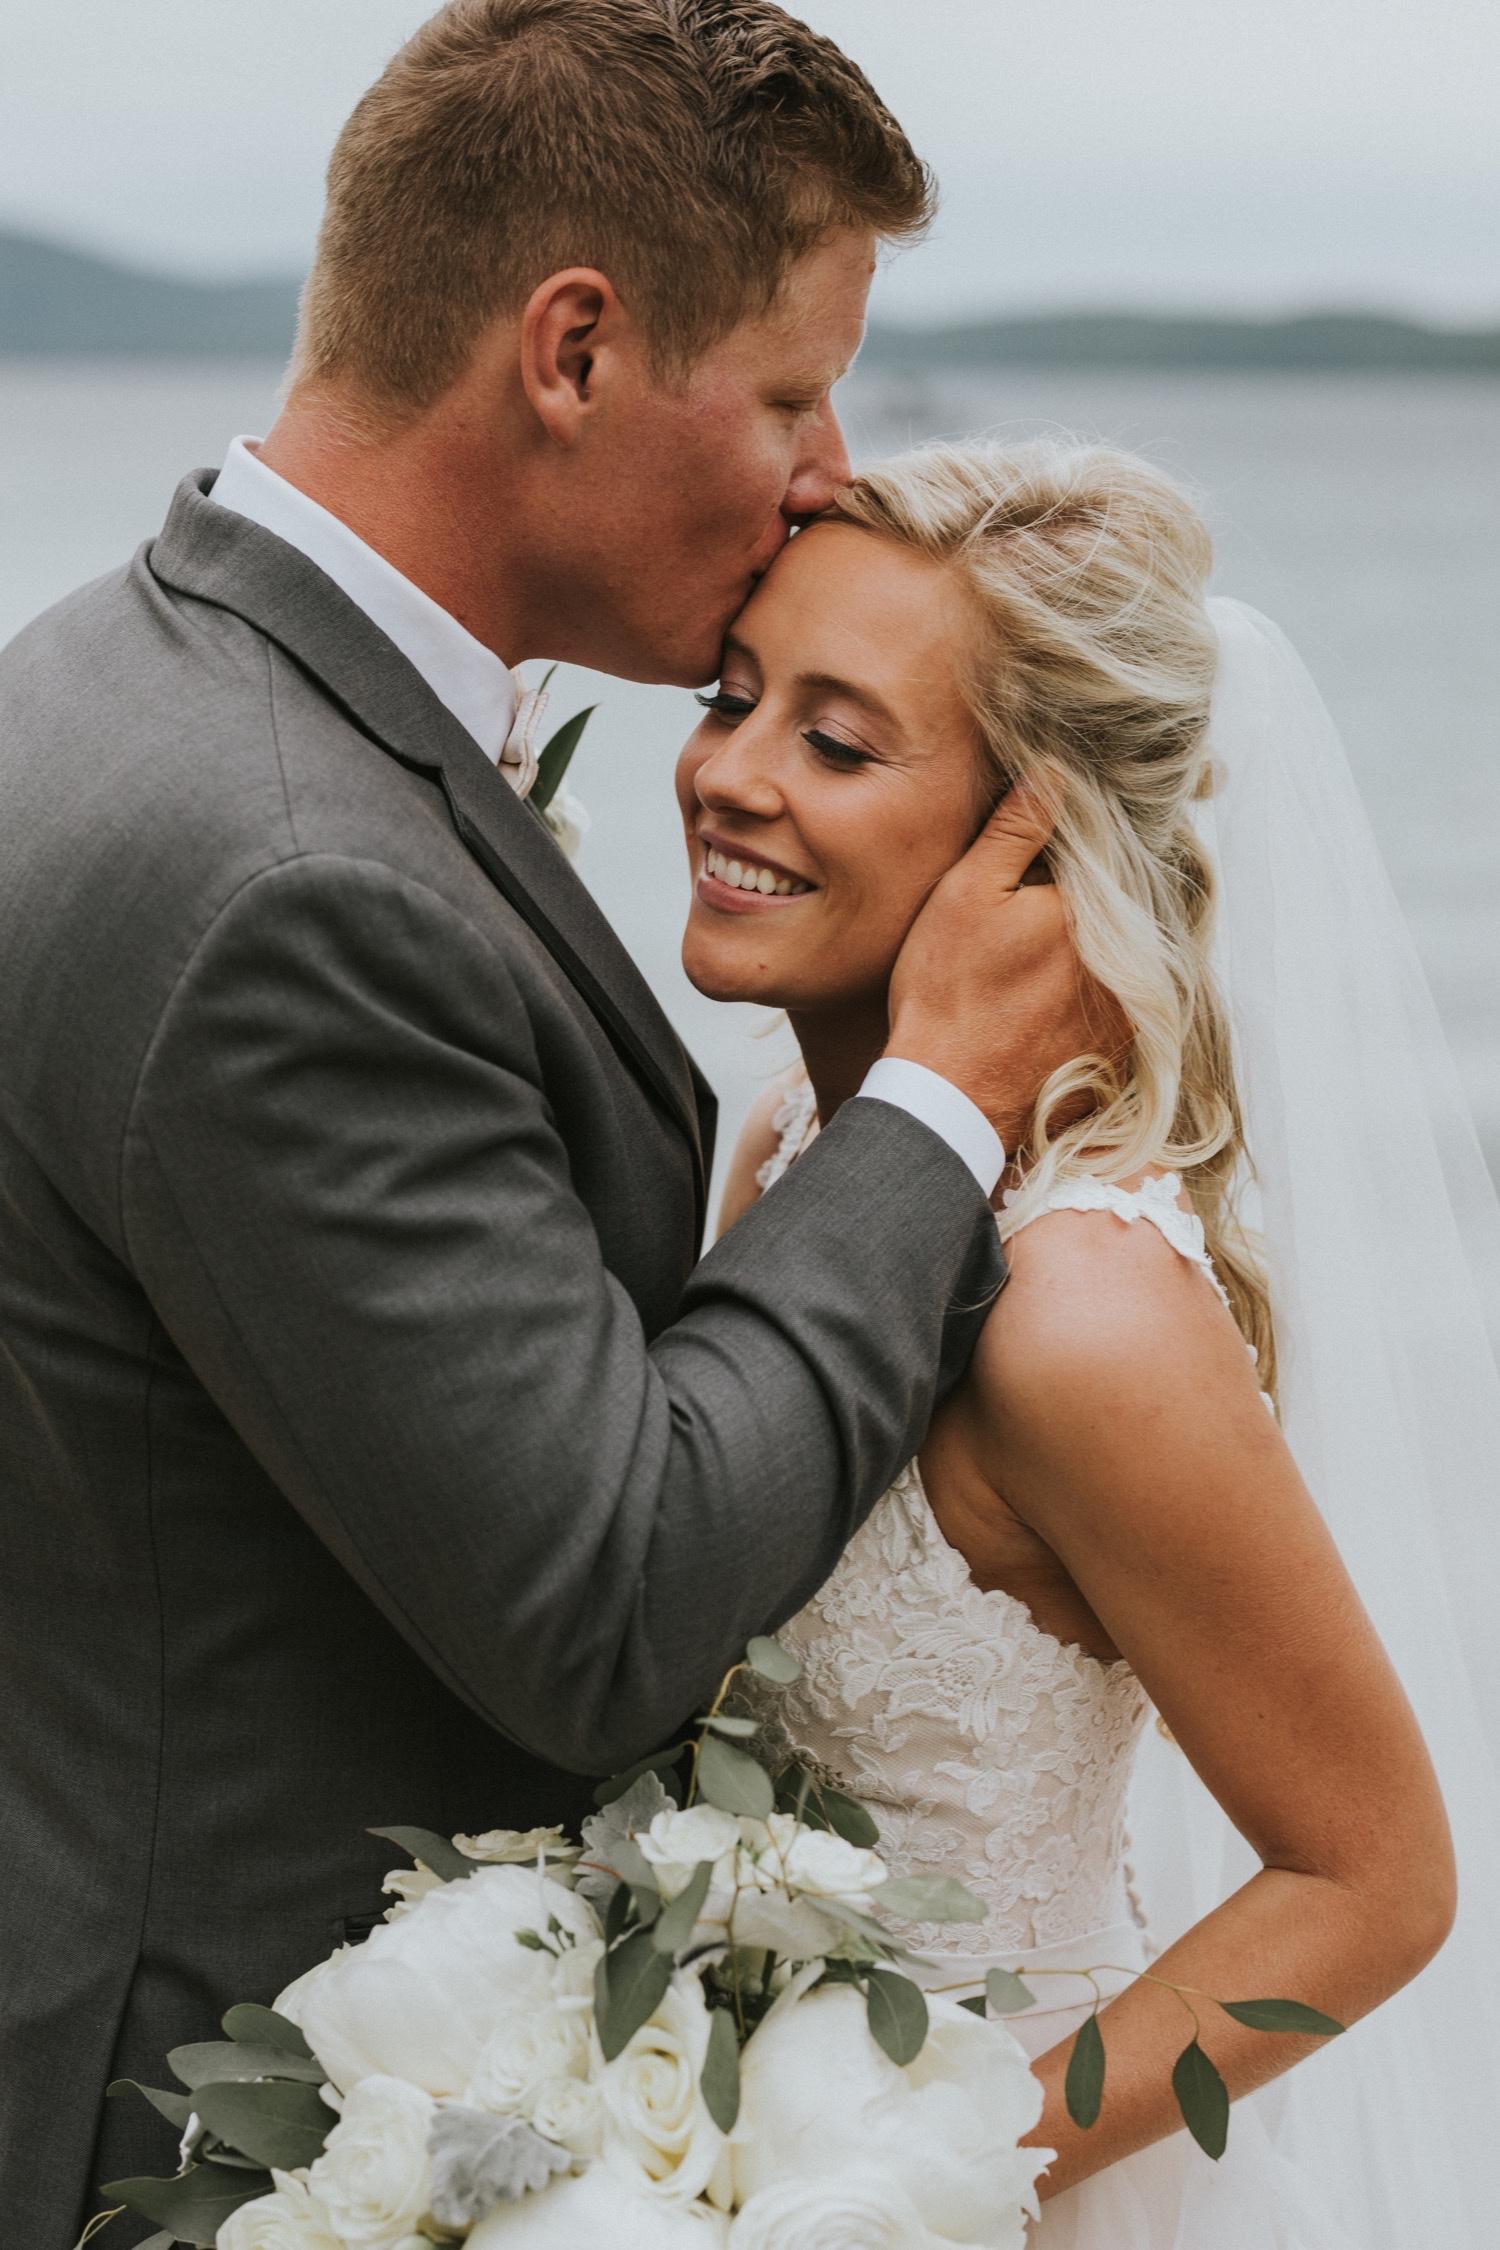 Hudson Valley Wedding Photographer, Silver Bay YMCA, Silver Bay Wedding, Lake George Wedding, New York Wedding Photographer, Lake George Wedding Photographer